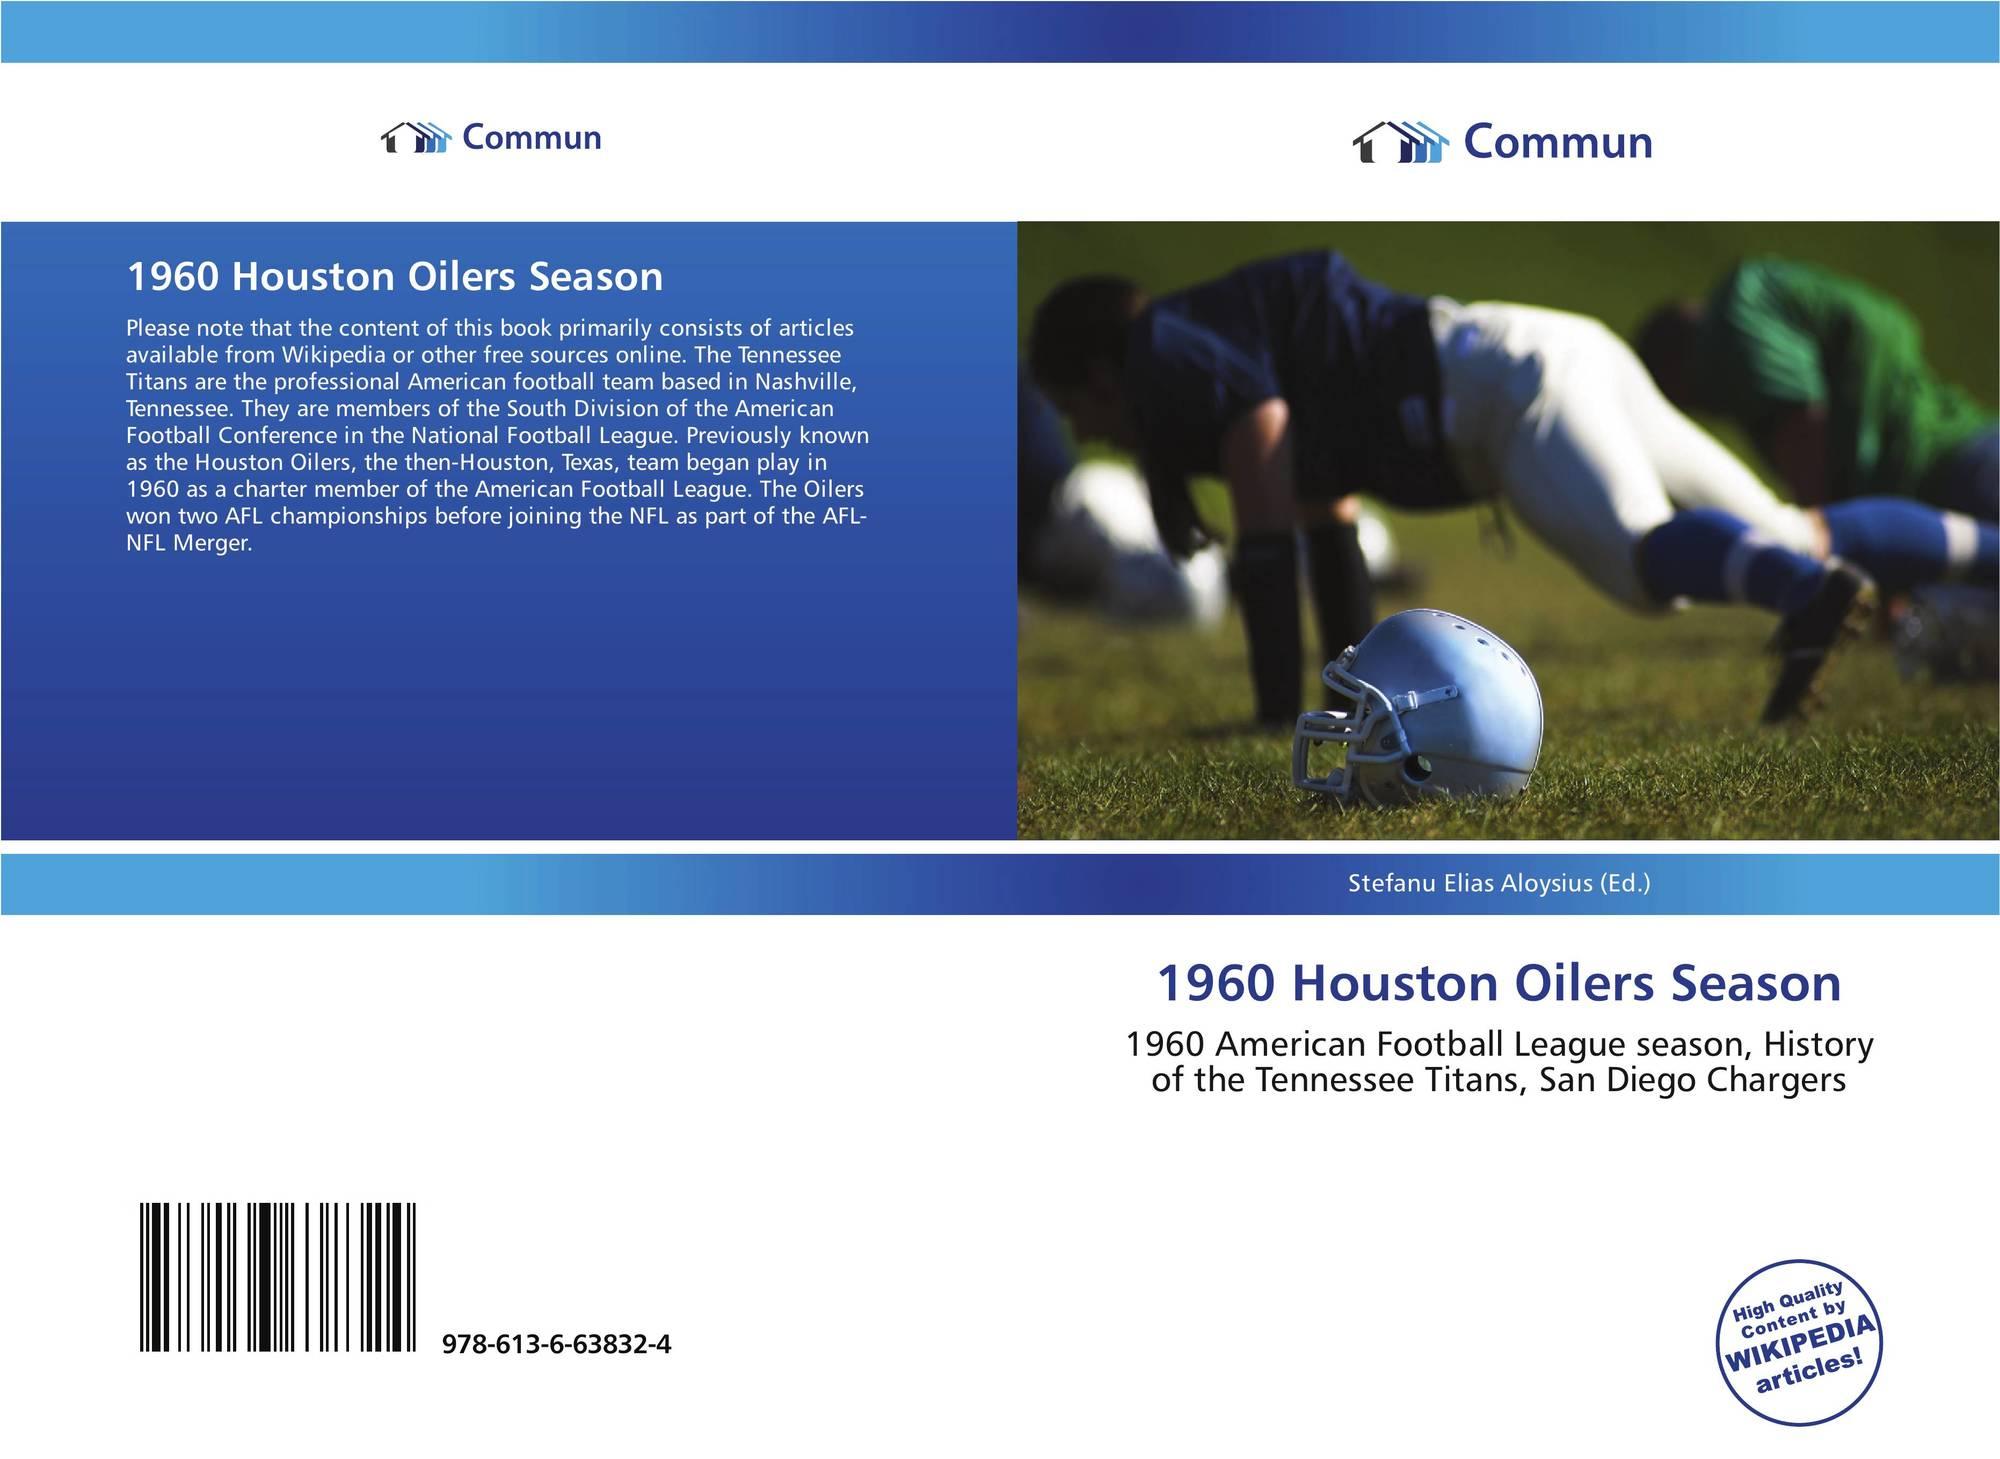 Bookcover of 1960 Houston Oilers Season. 9786136638324 4a8aadafa